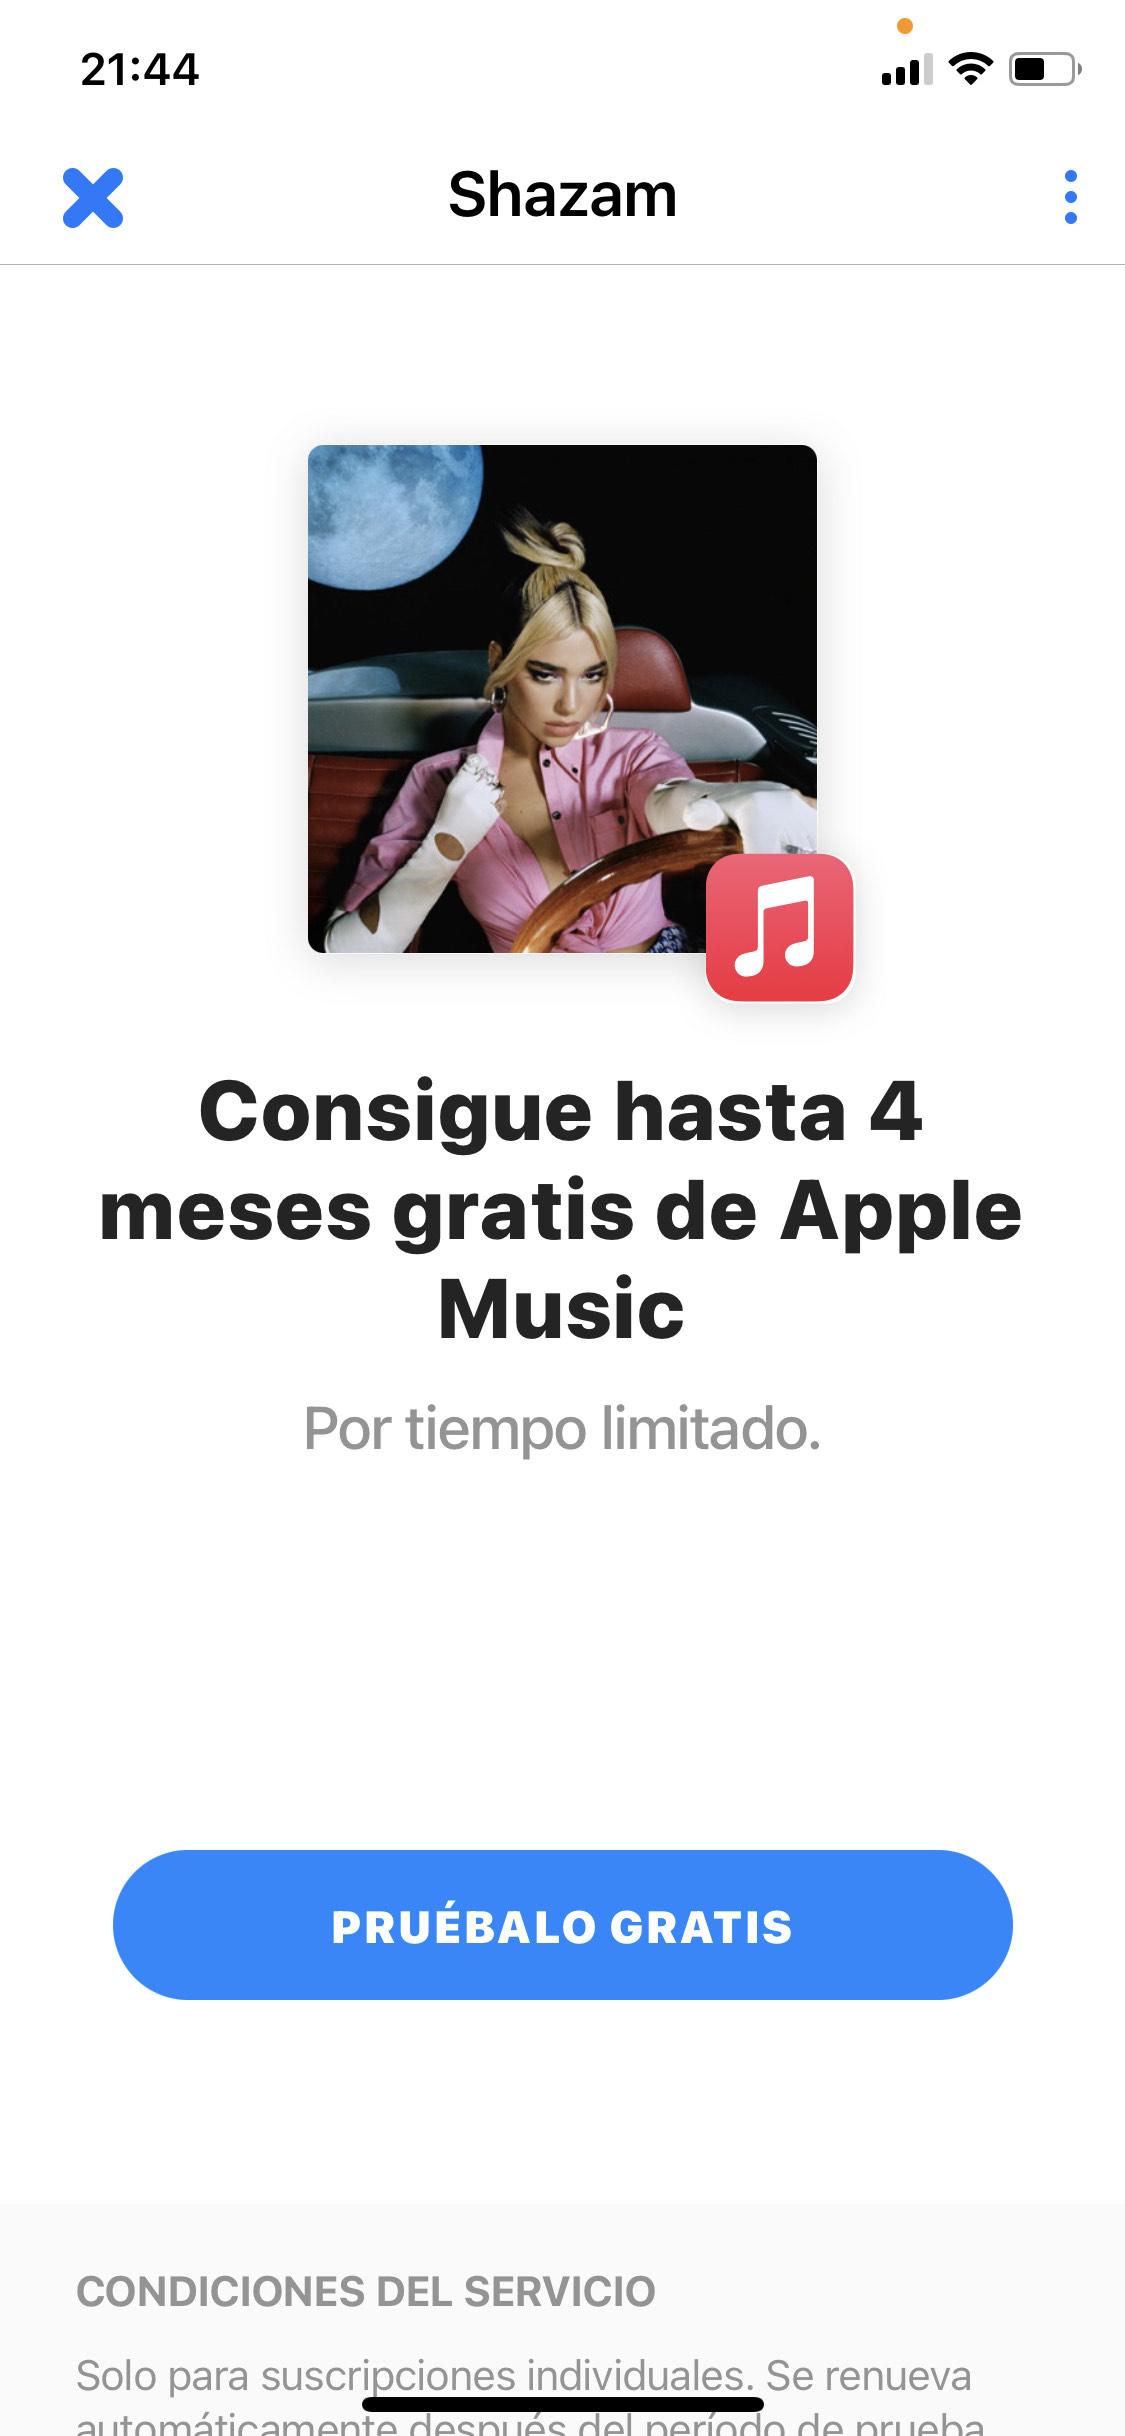 Shazam: 4 meses gratis de Apple Music